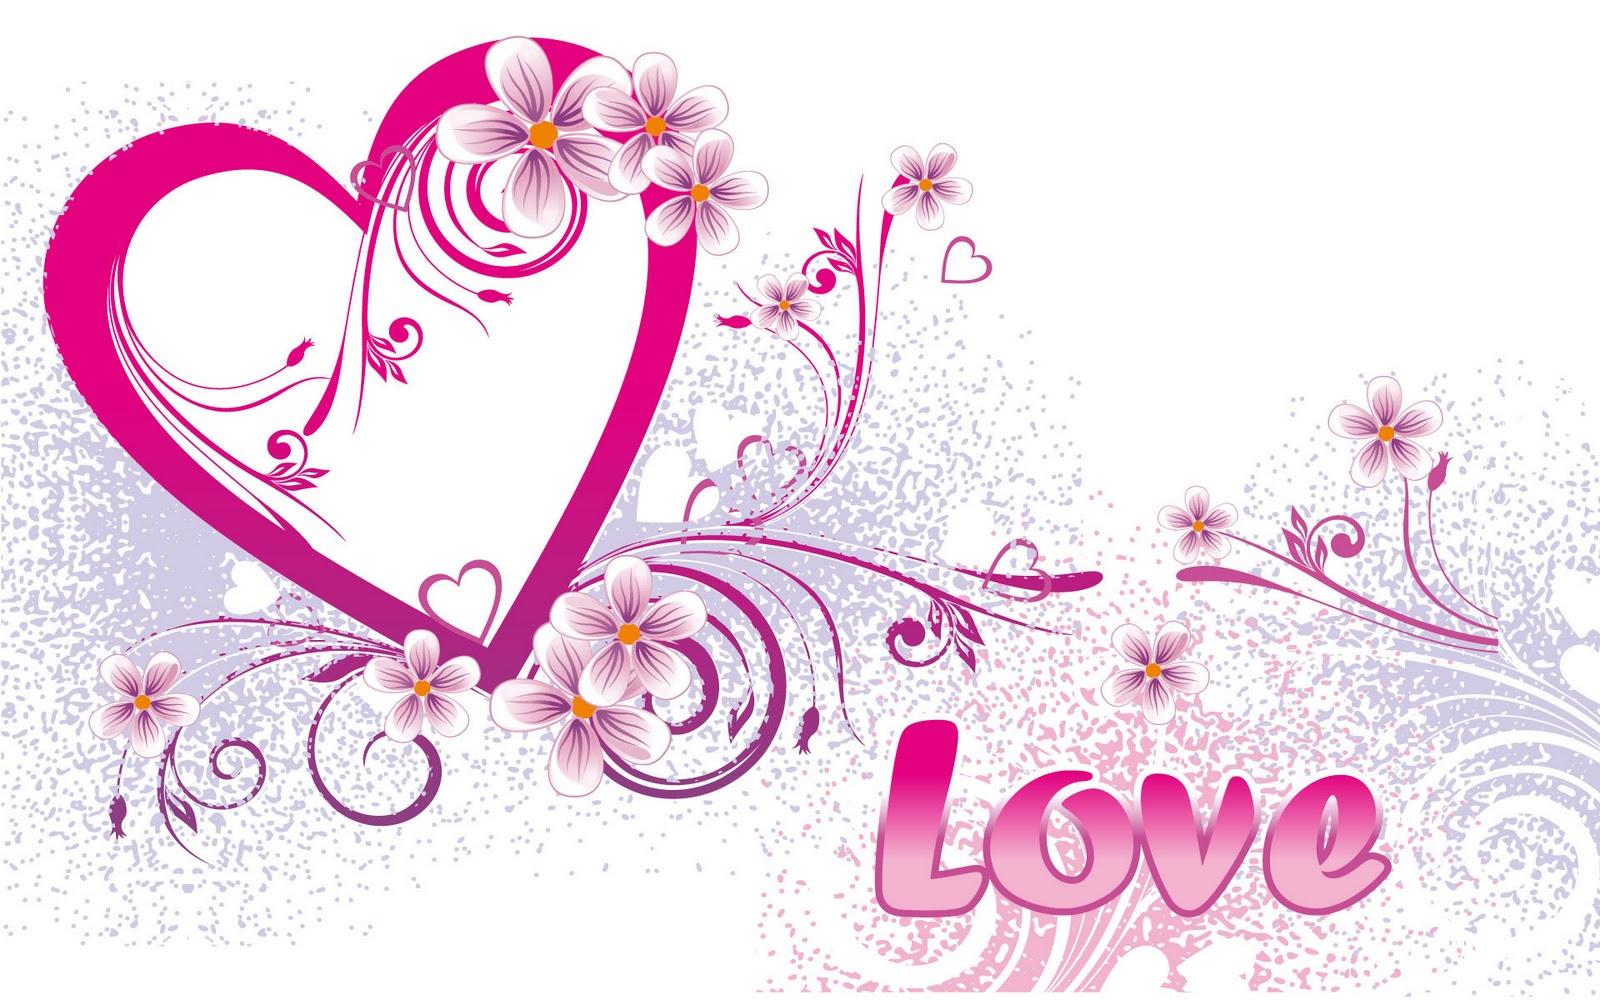 Love Wallpaper Full Image : Papel de parede para seu celular: Papel de parede de amor